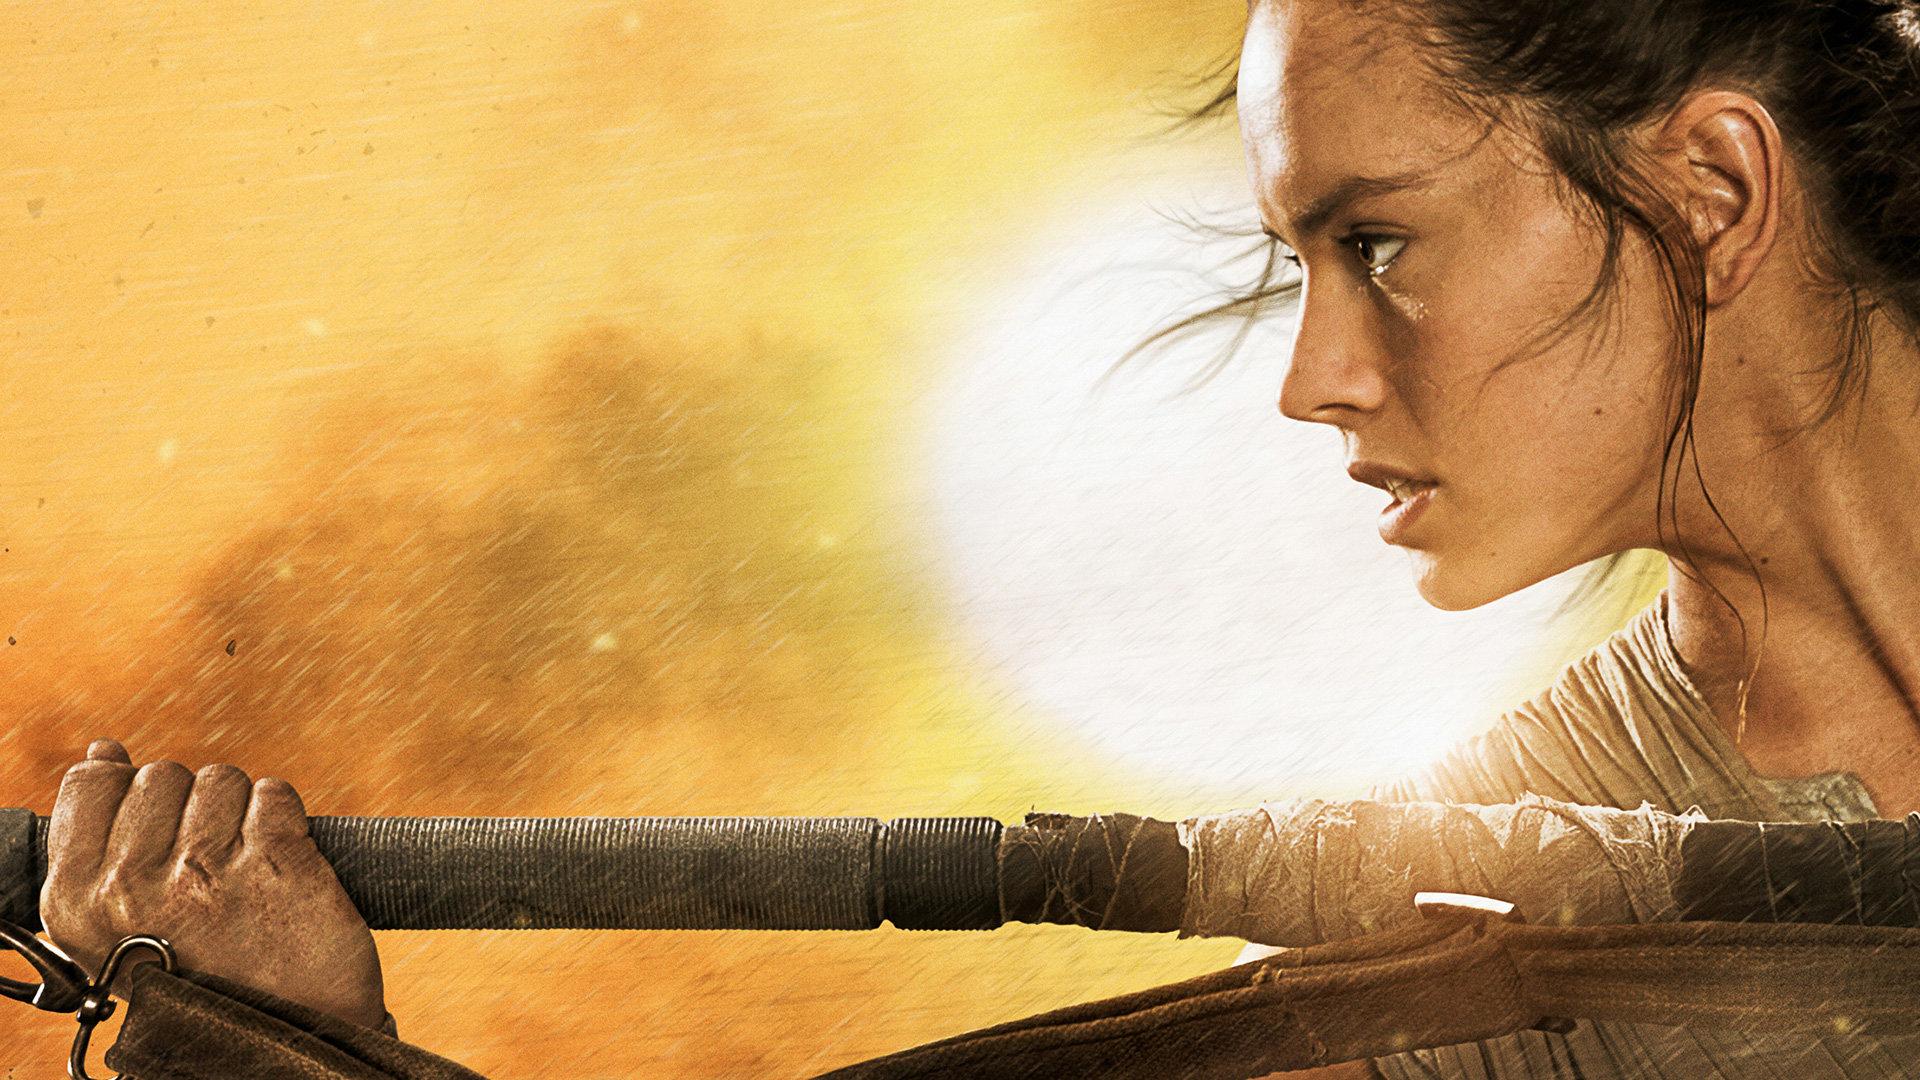 Rey Star Wars Wallpapers Hd For Desktop Backgrounds